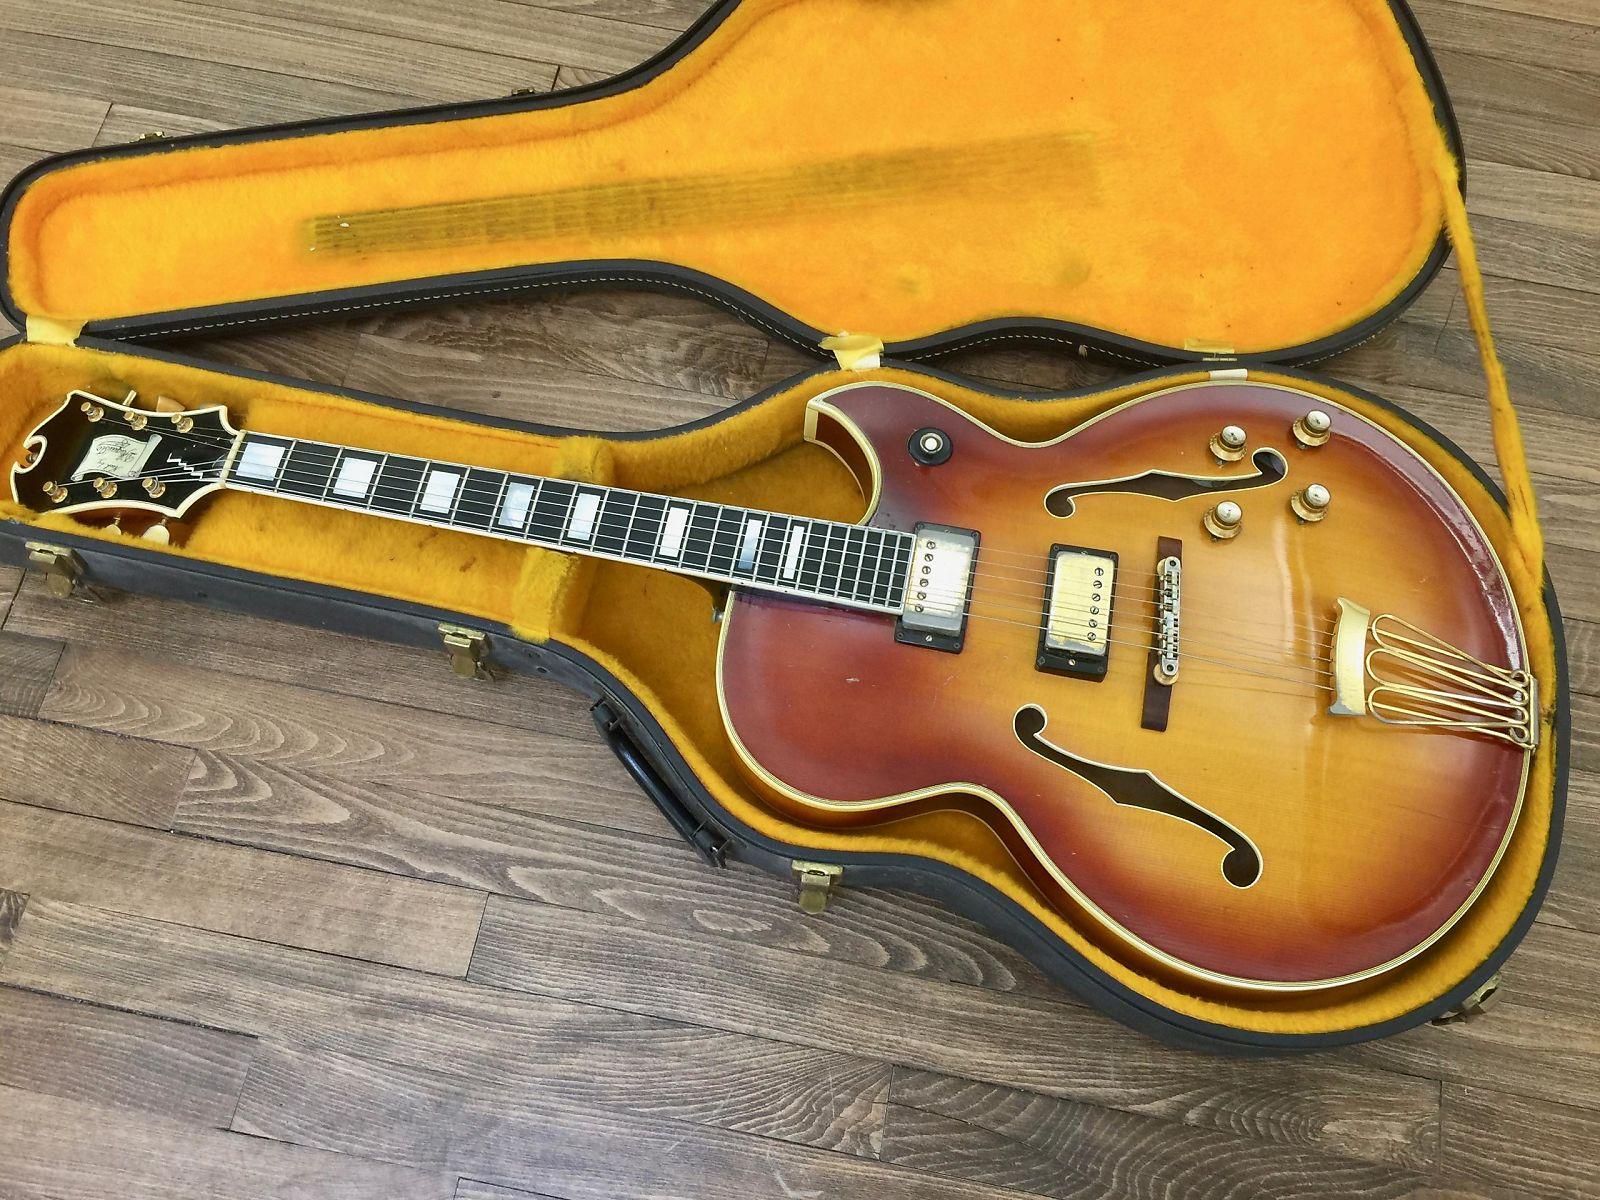 1964 Gibson/D'Aquisto Byrdland Archtop Guitar